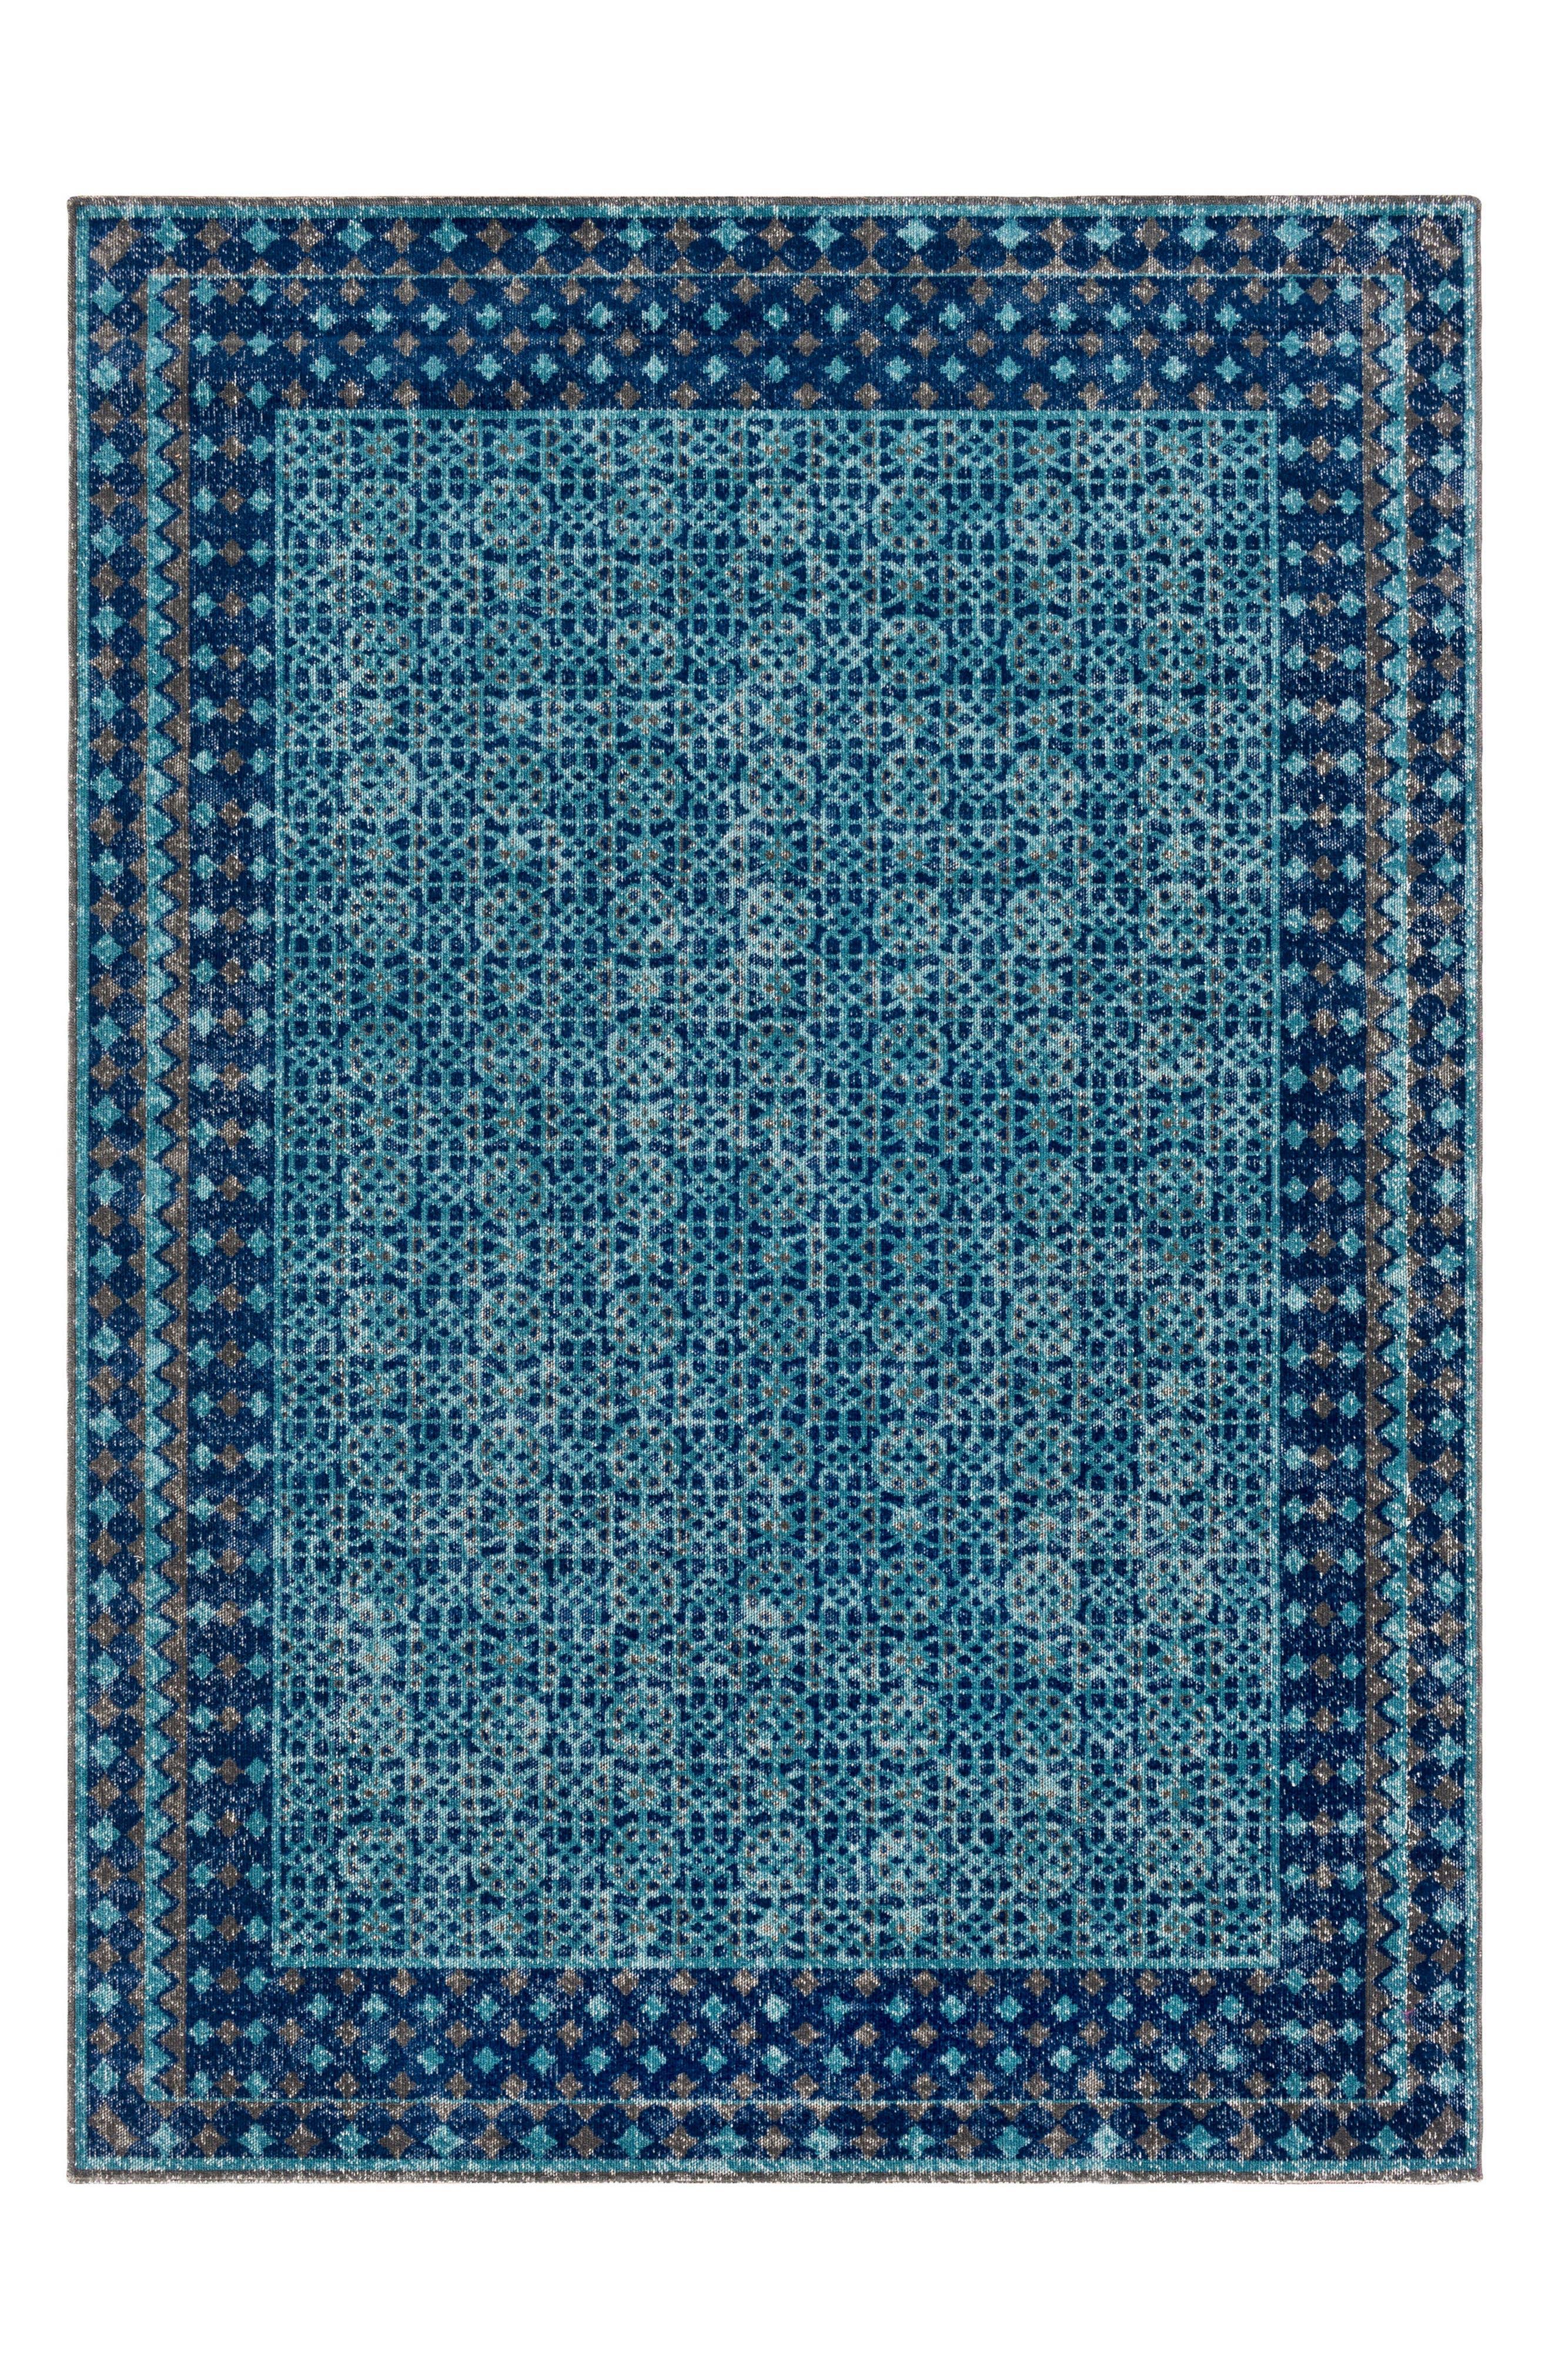 Tessera Border Rug,                         Main,                         color, 440